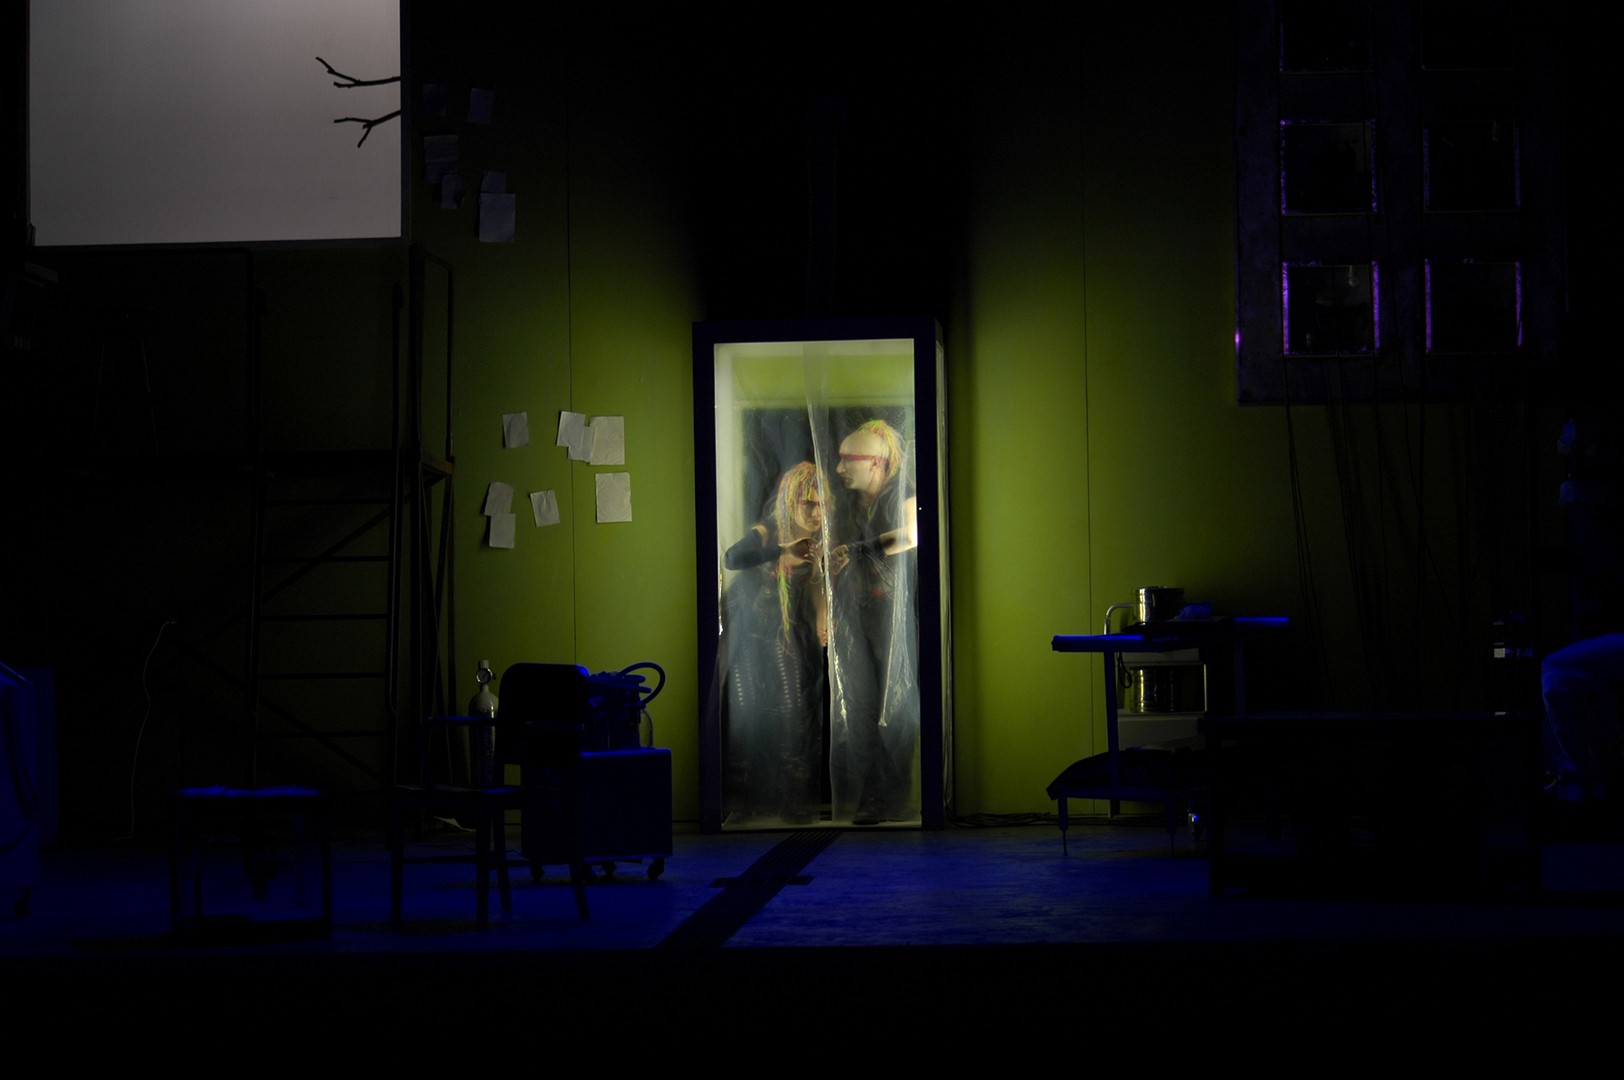 Serva-Padrona-Opera-directed-by-Jacopo-Spirei-1